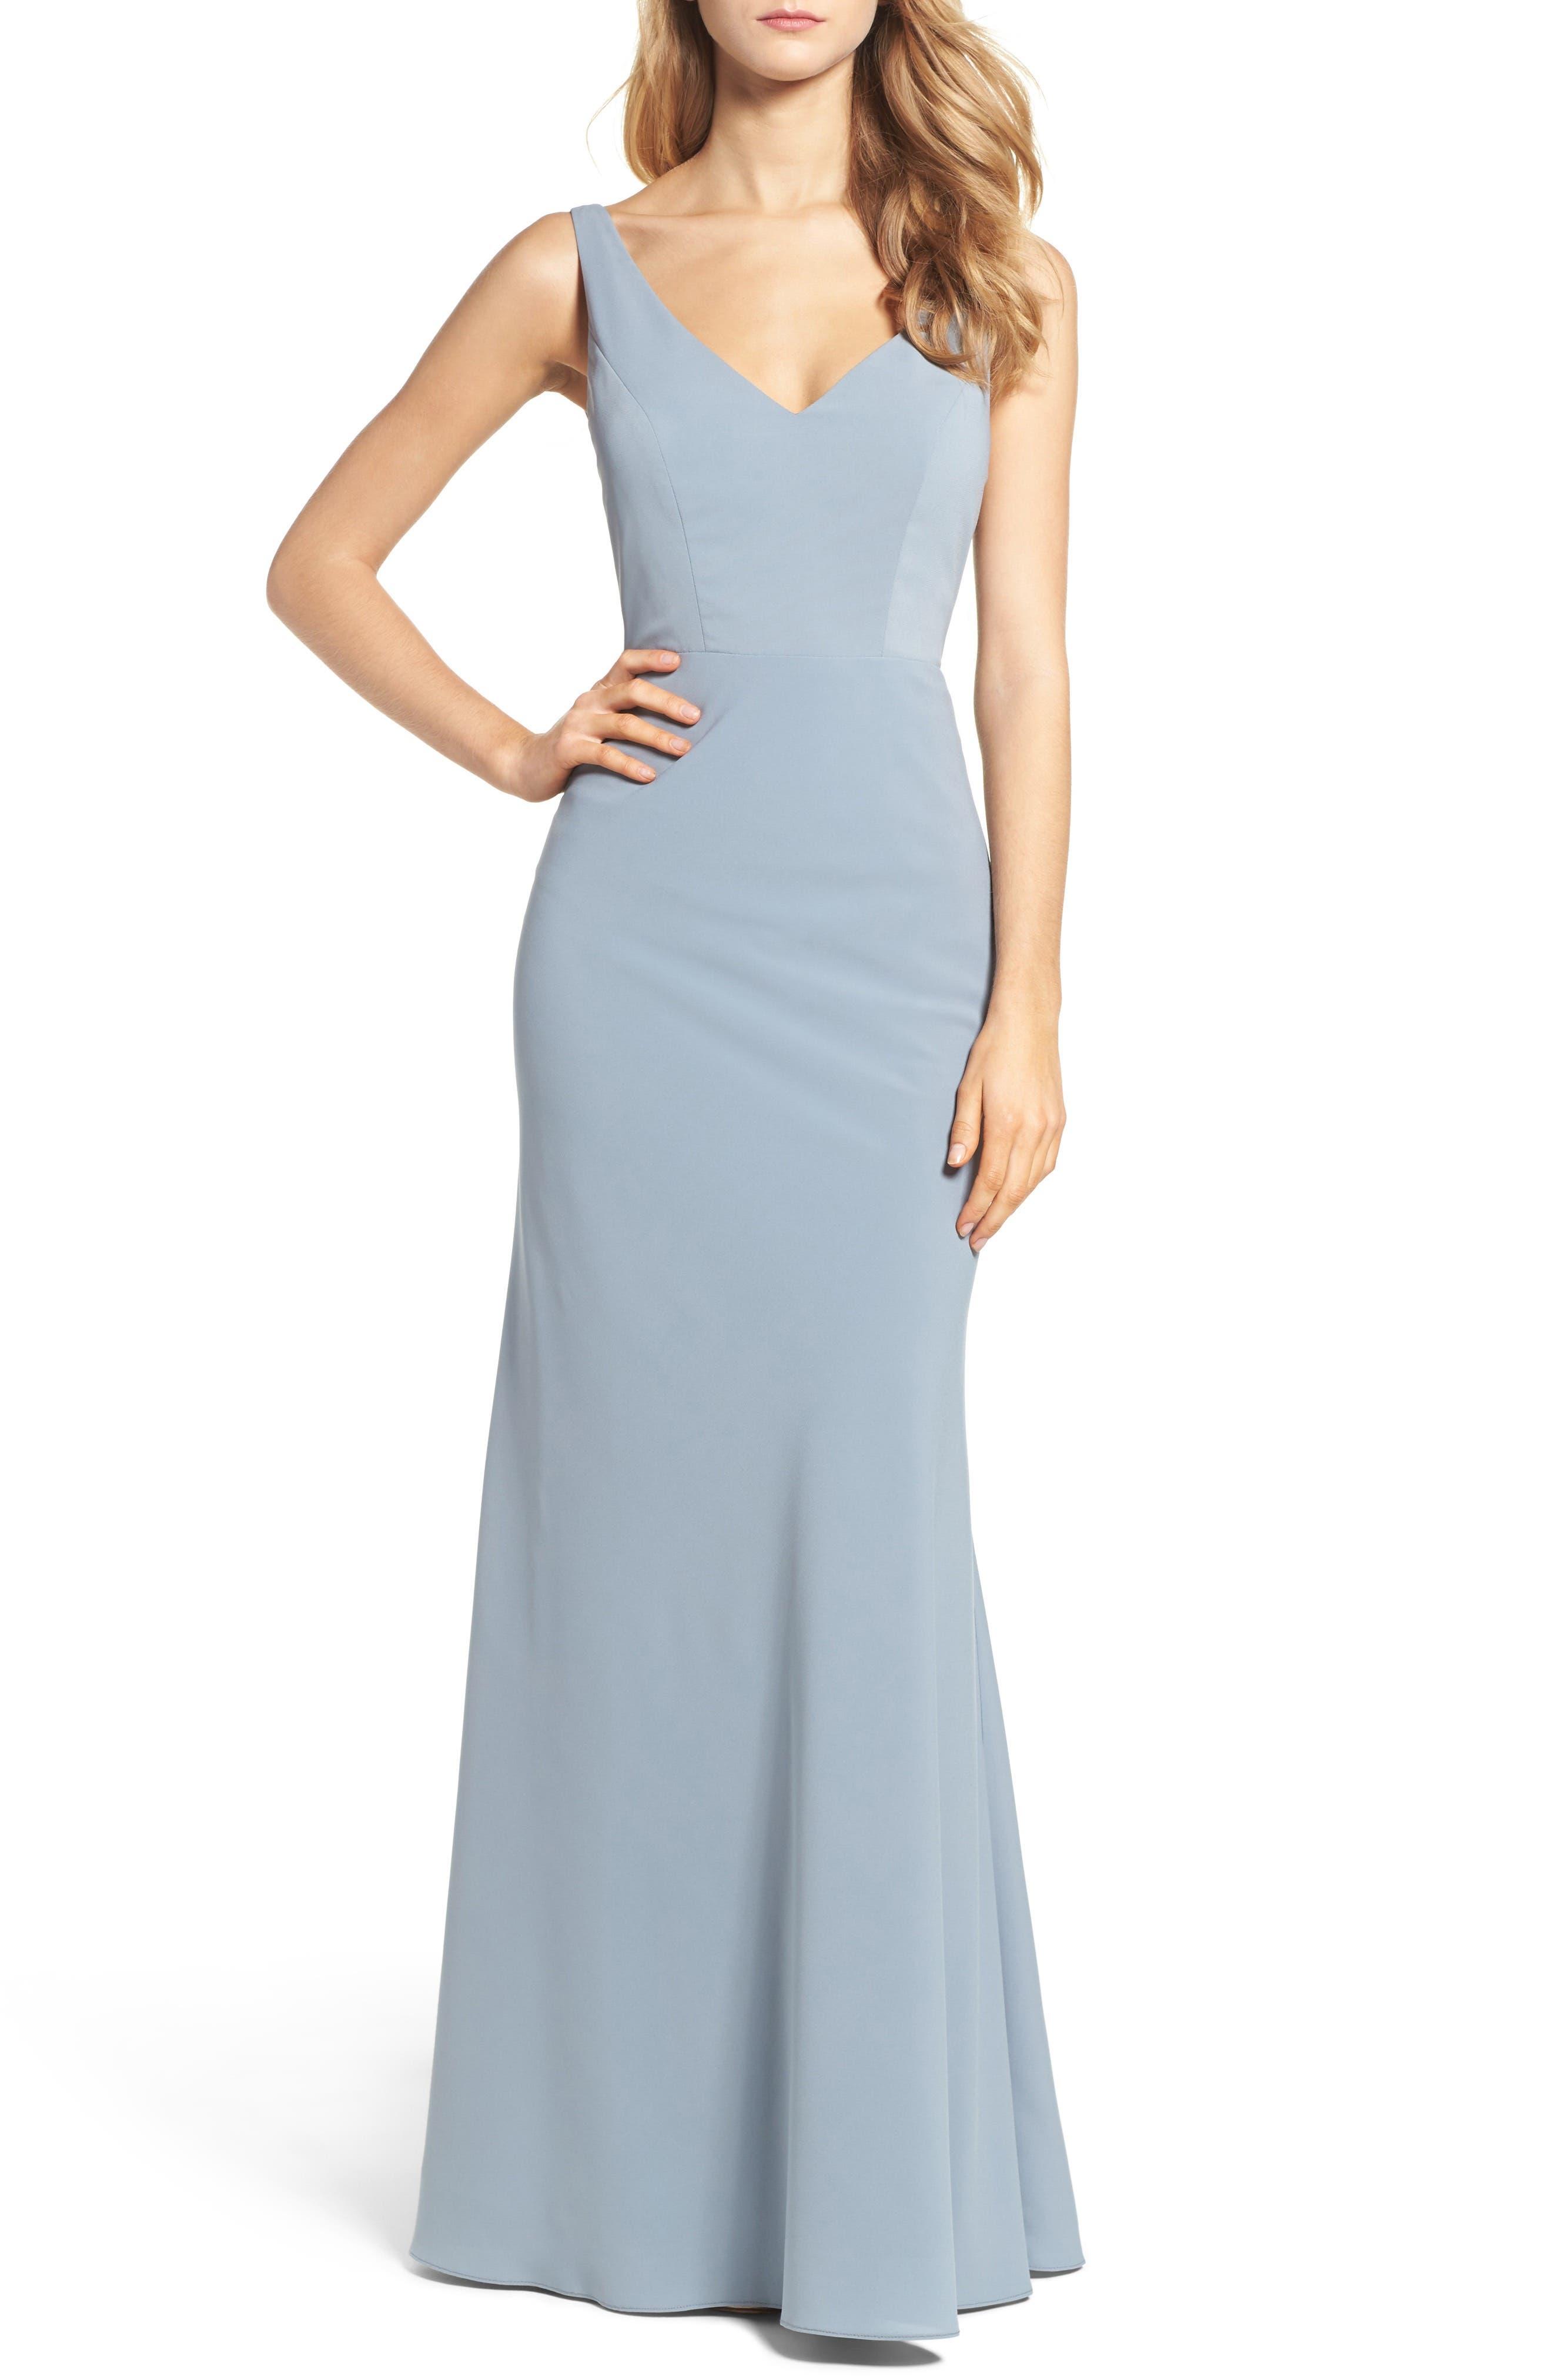 Delaney Tie Back V-Neck Gown,                             Main thumbnail 1, color,                             450